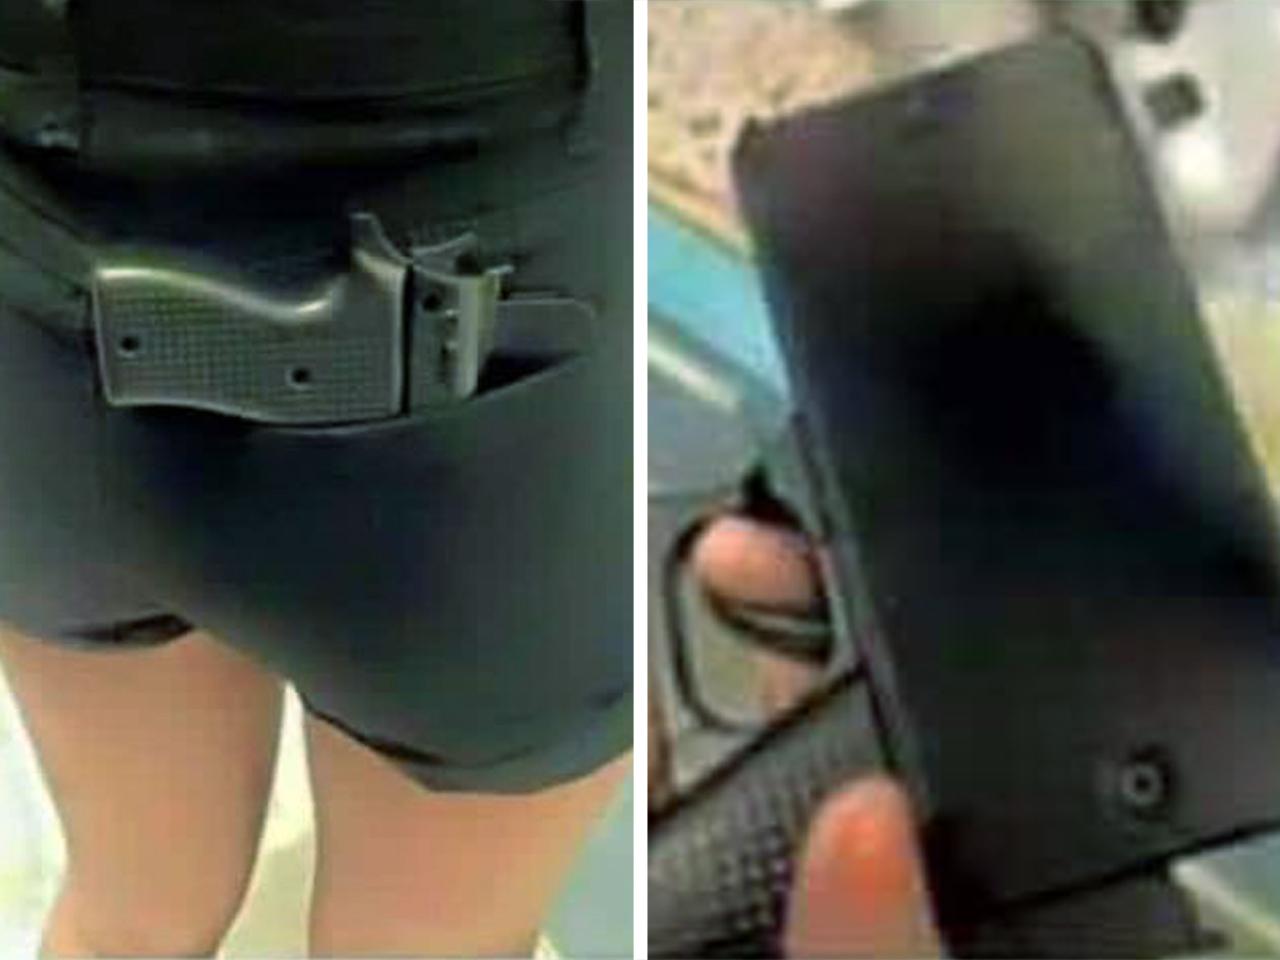 New Jersey Cops Warn Against Gun-Shaped Cellphone Case